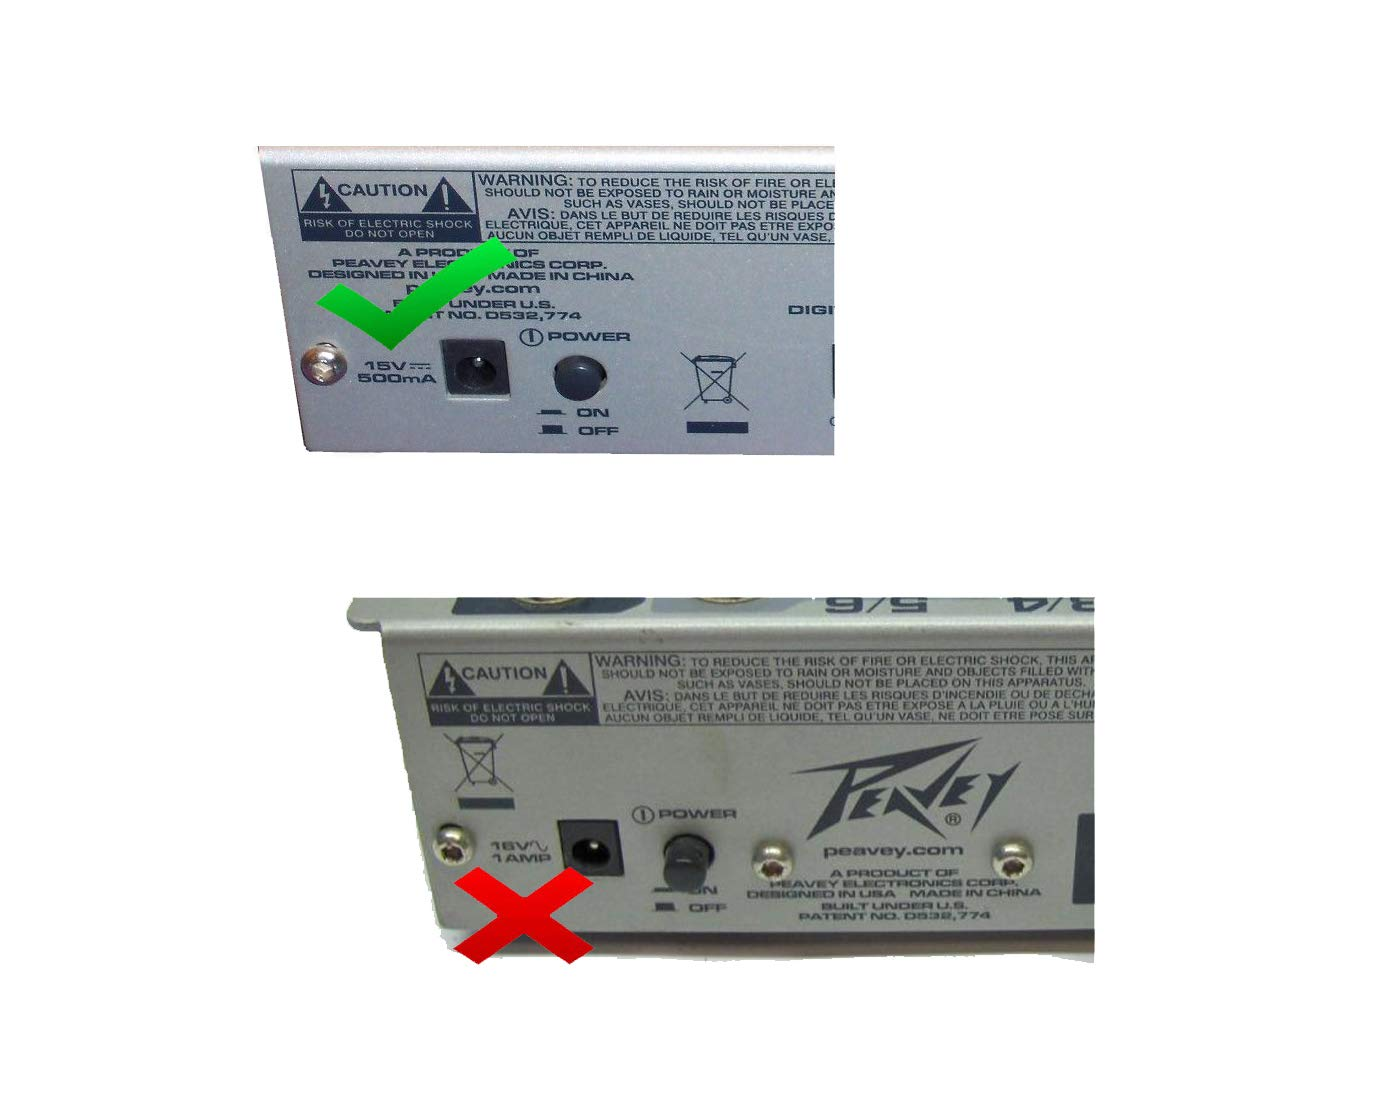 16 Volt AC Adapter PSU 16VAC Power Supply fits Peavey Deltafex Processor